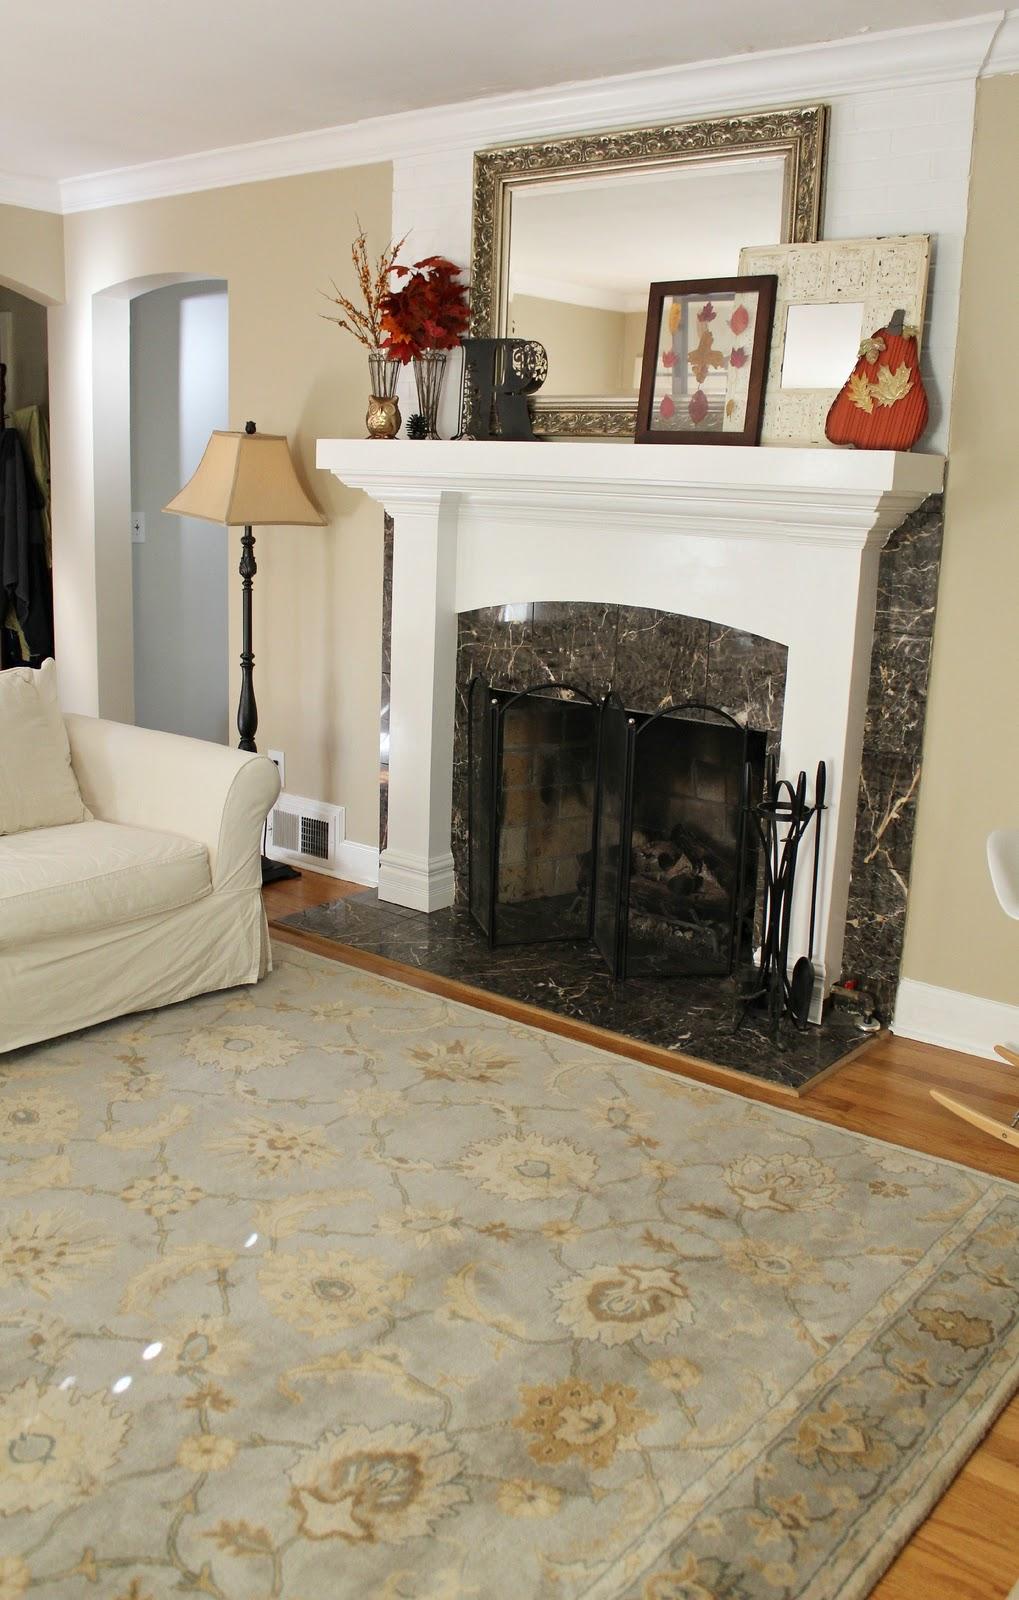 Ten june living room tweak list a new rug for The living room channel 10 rug